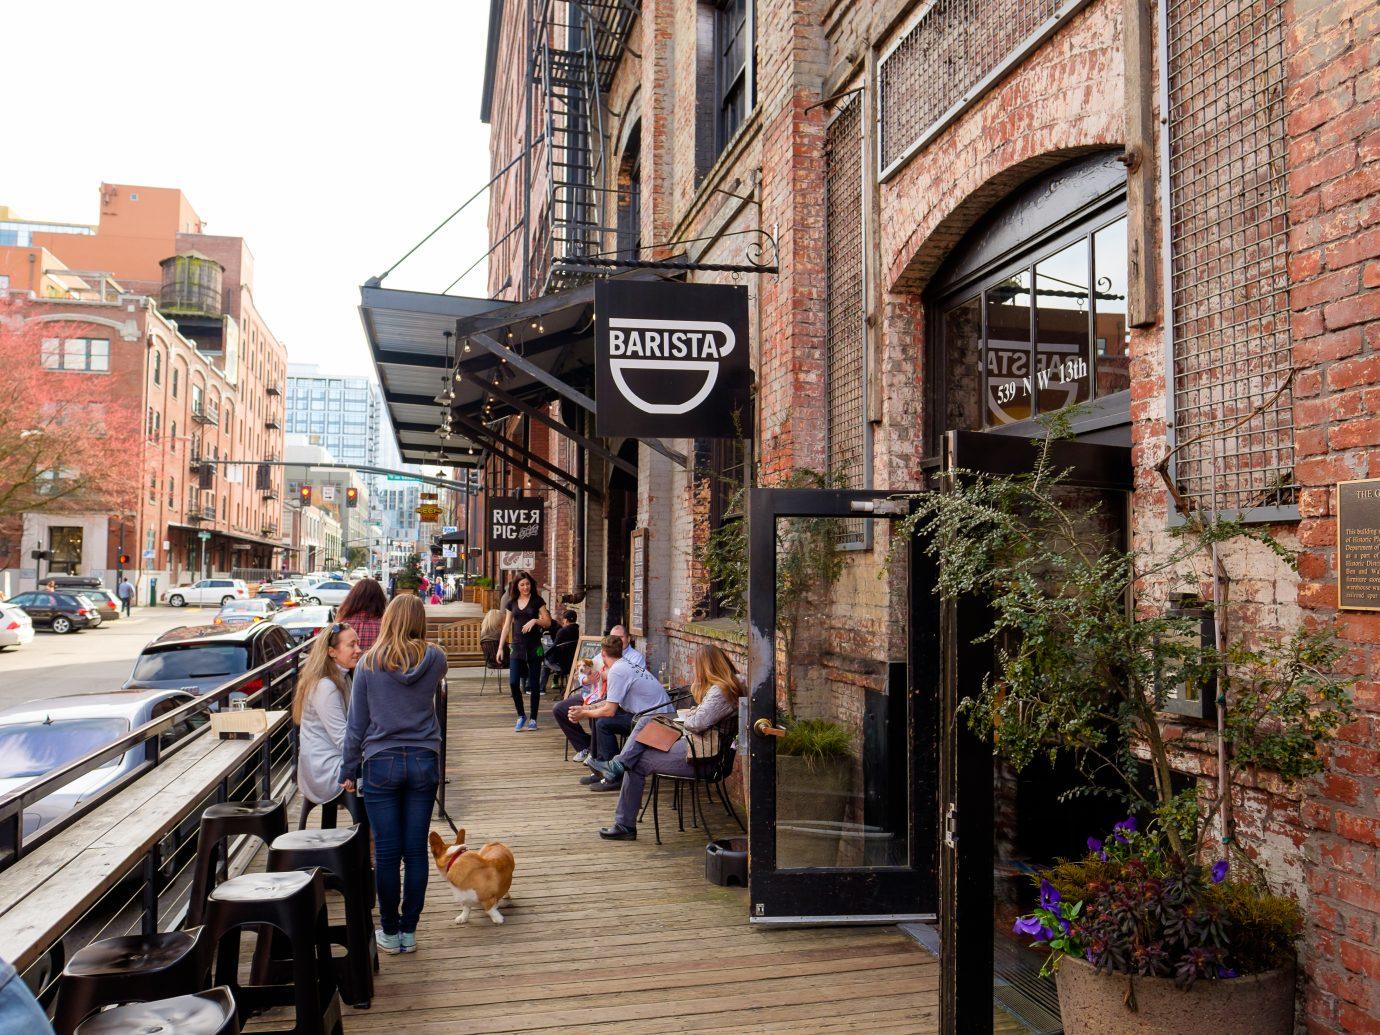 Barista coffee shop in the Pearl District of Portland Oregon.